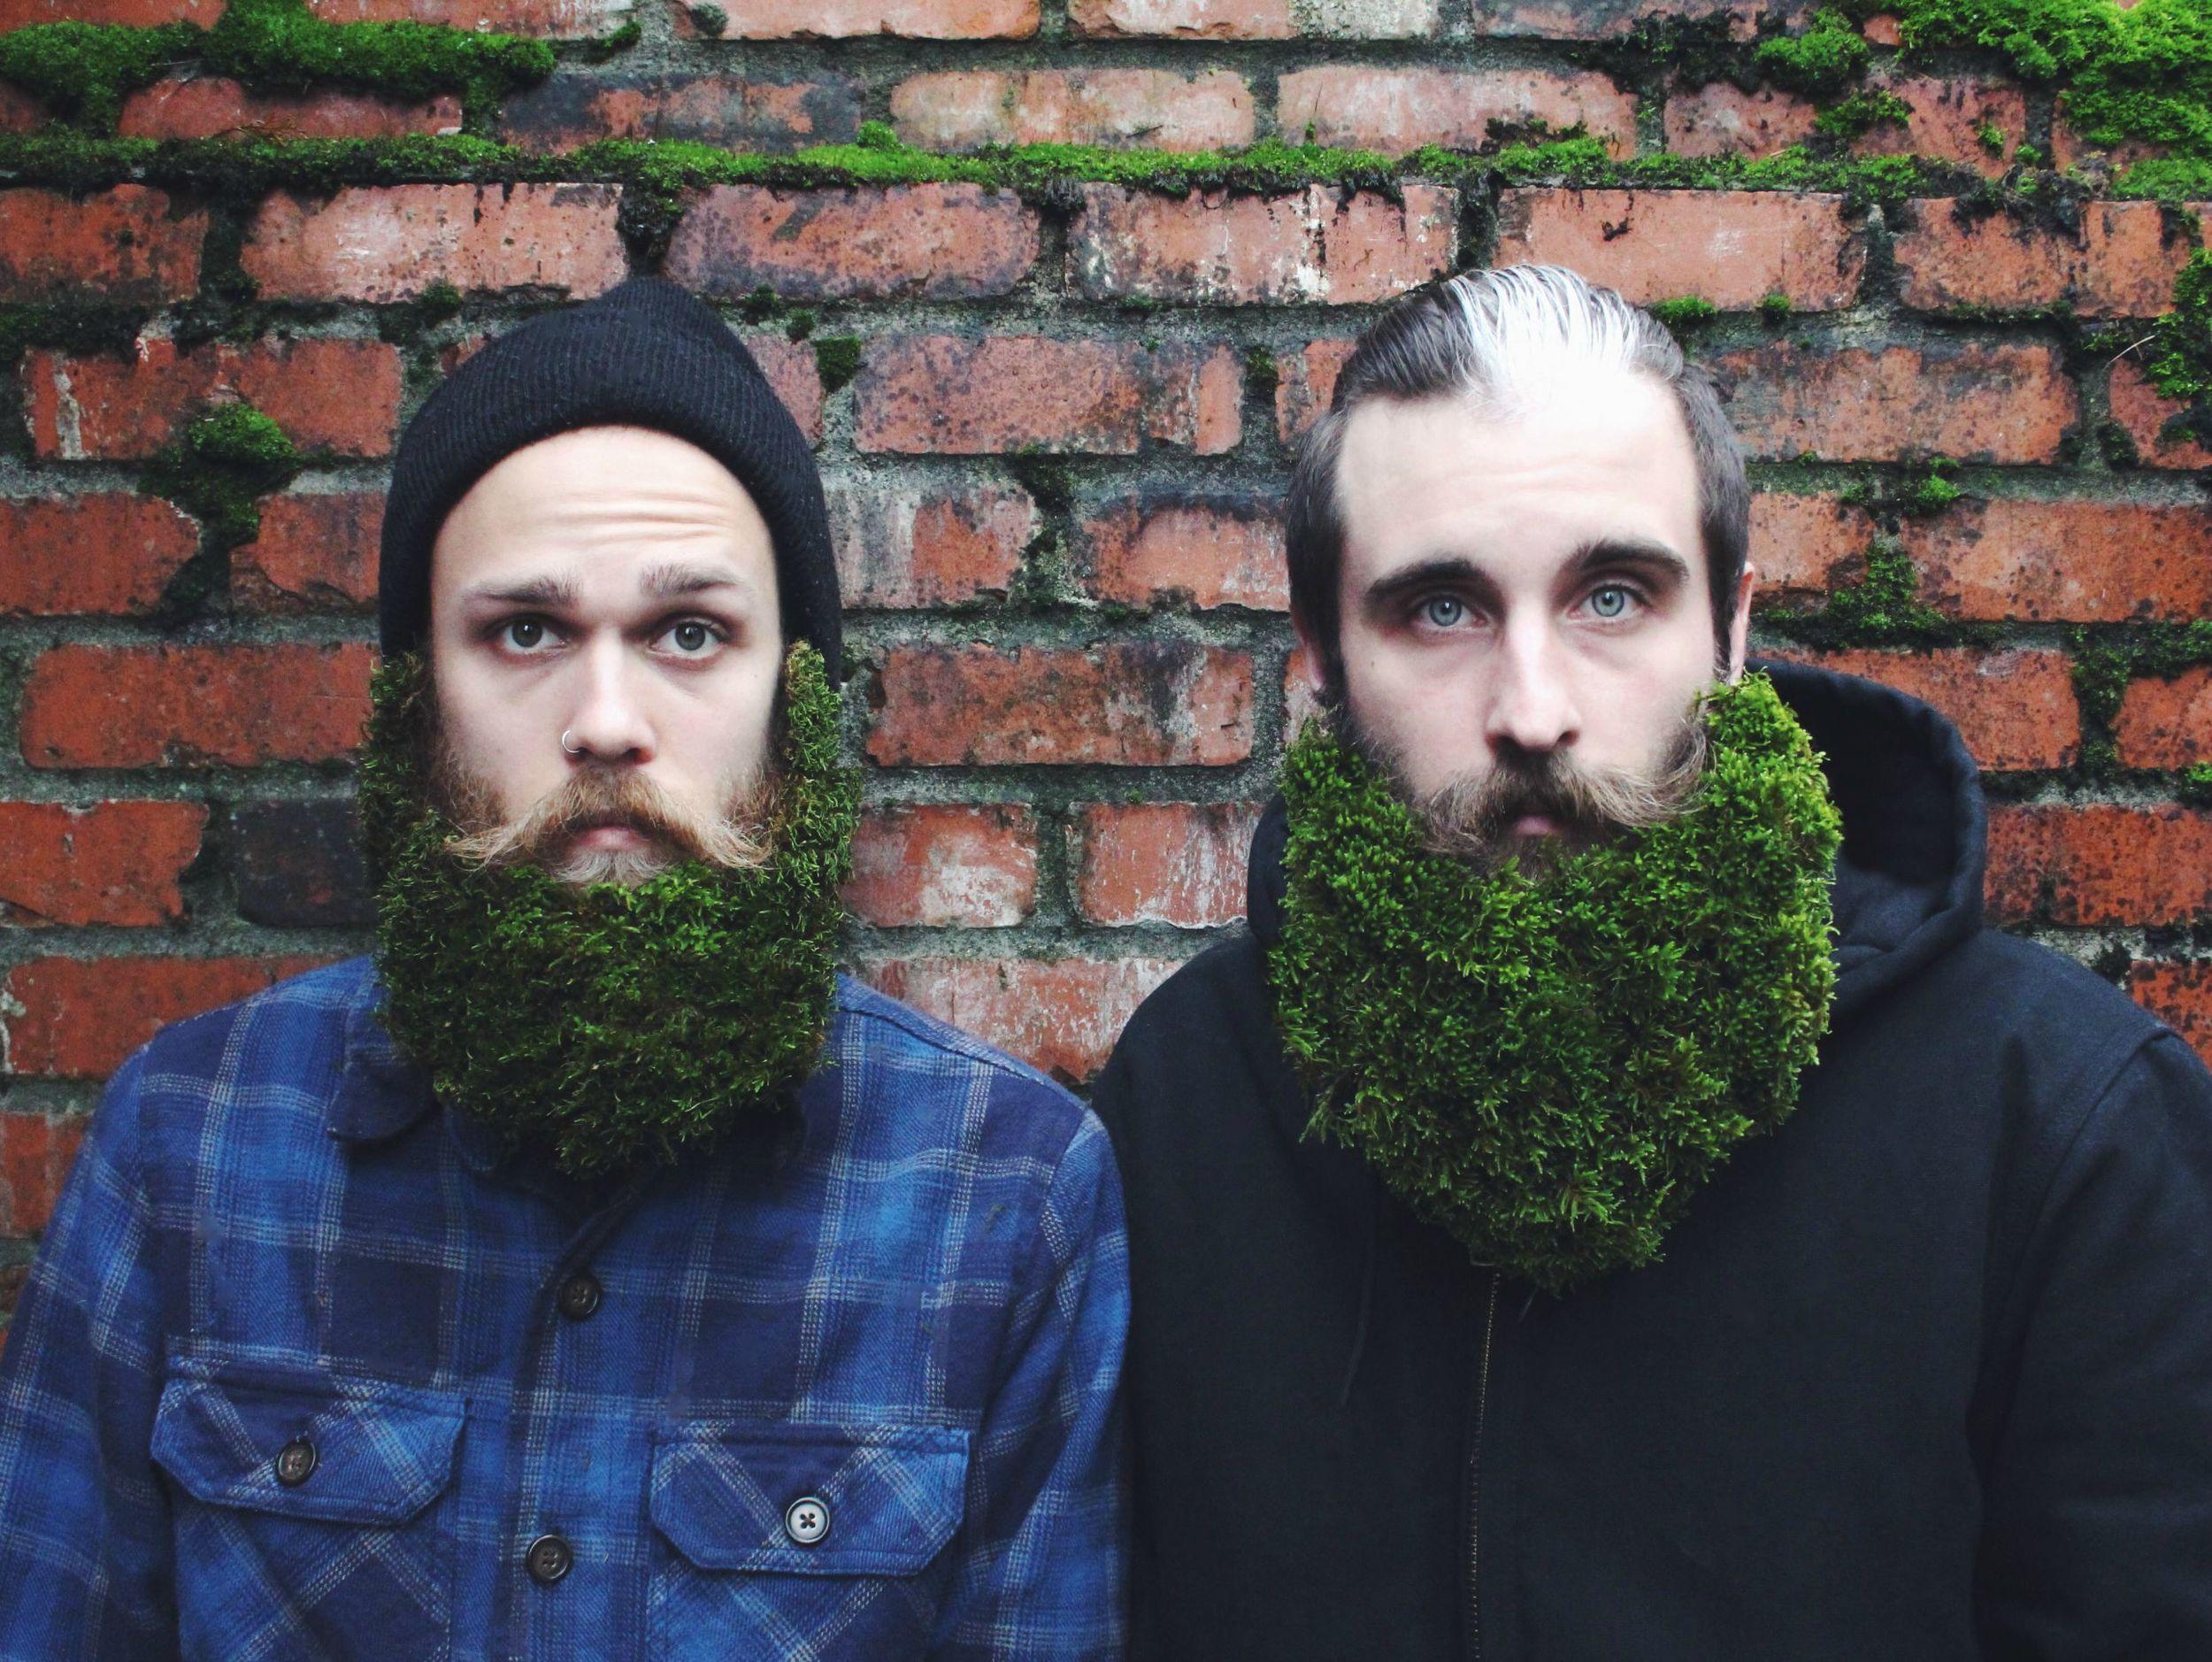 beard-holders-06.jpg